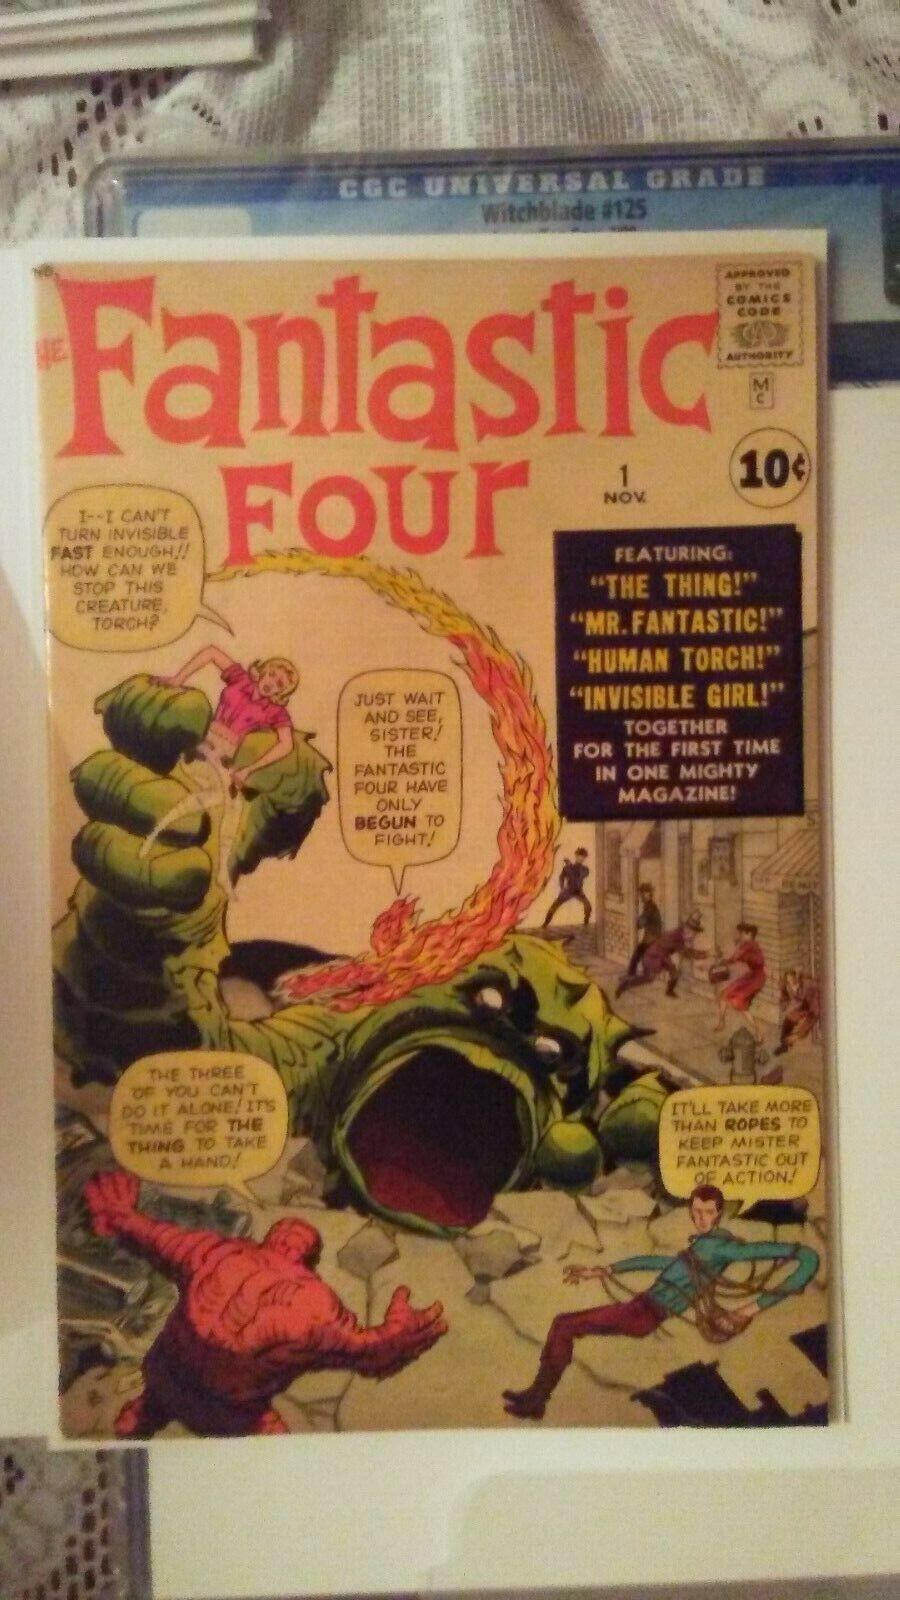 Fantastic Four #1 Vol 1 Super High Grade 1st App of Fantastic Four Original 1961